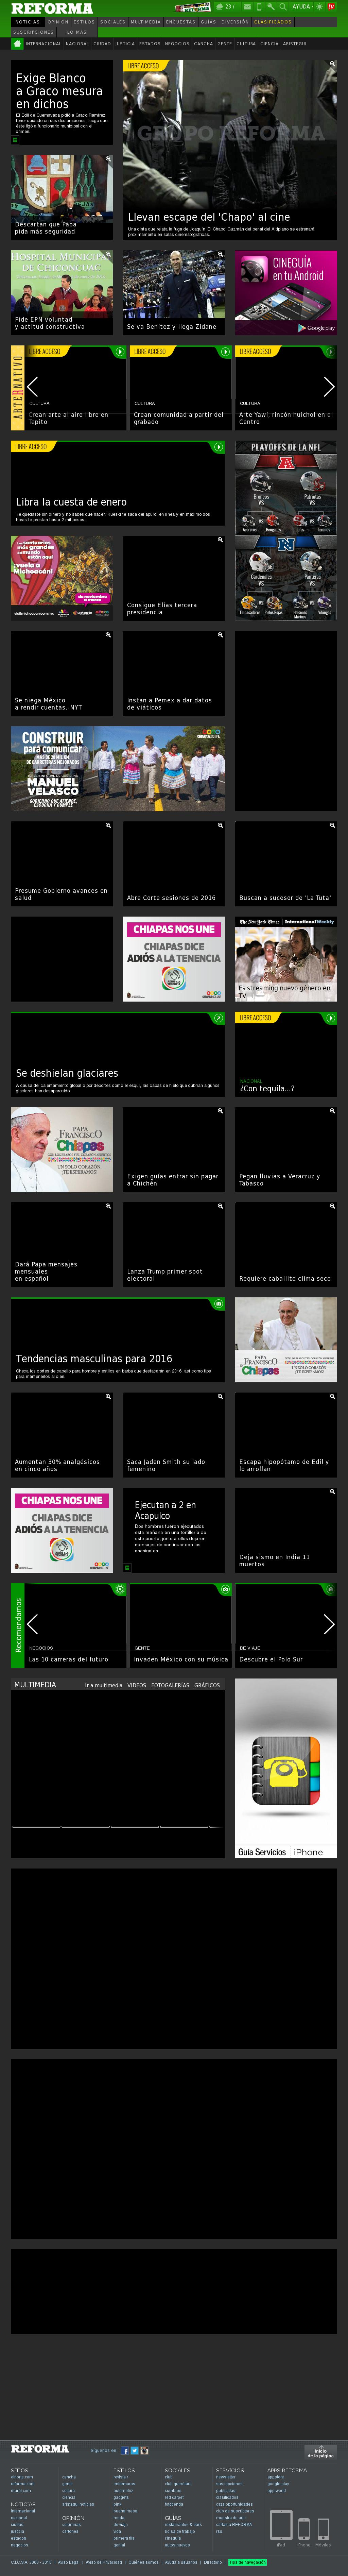 Reforma.com at Monday Jan. 4, 2016, 9:20 p.m. UTC